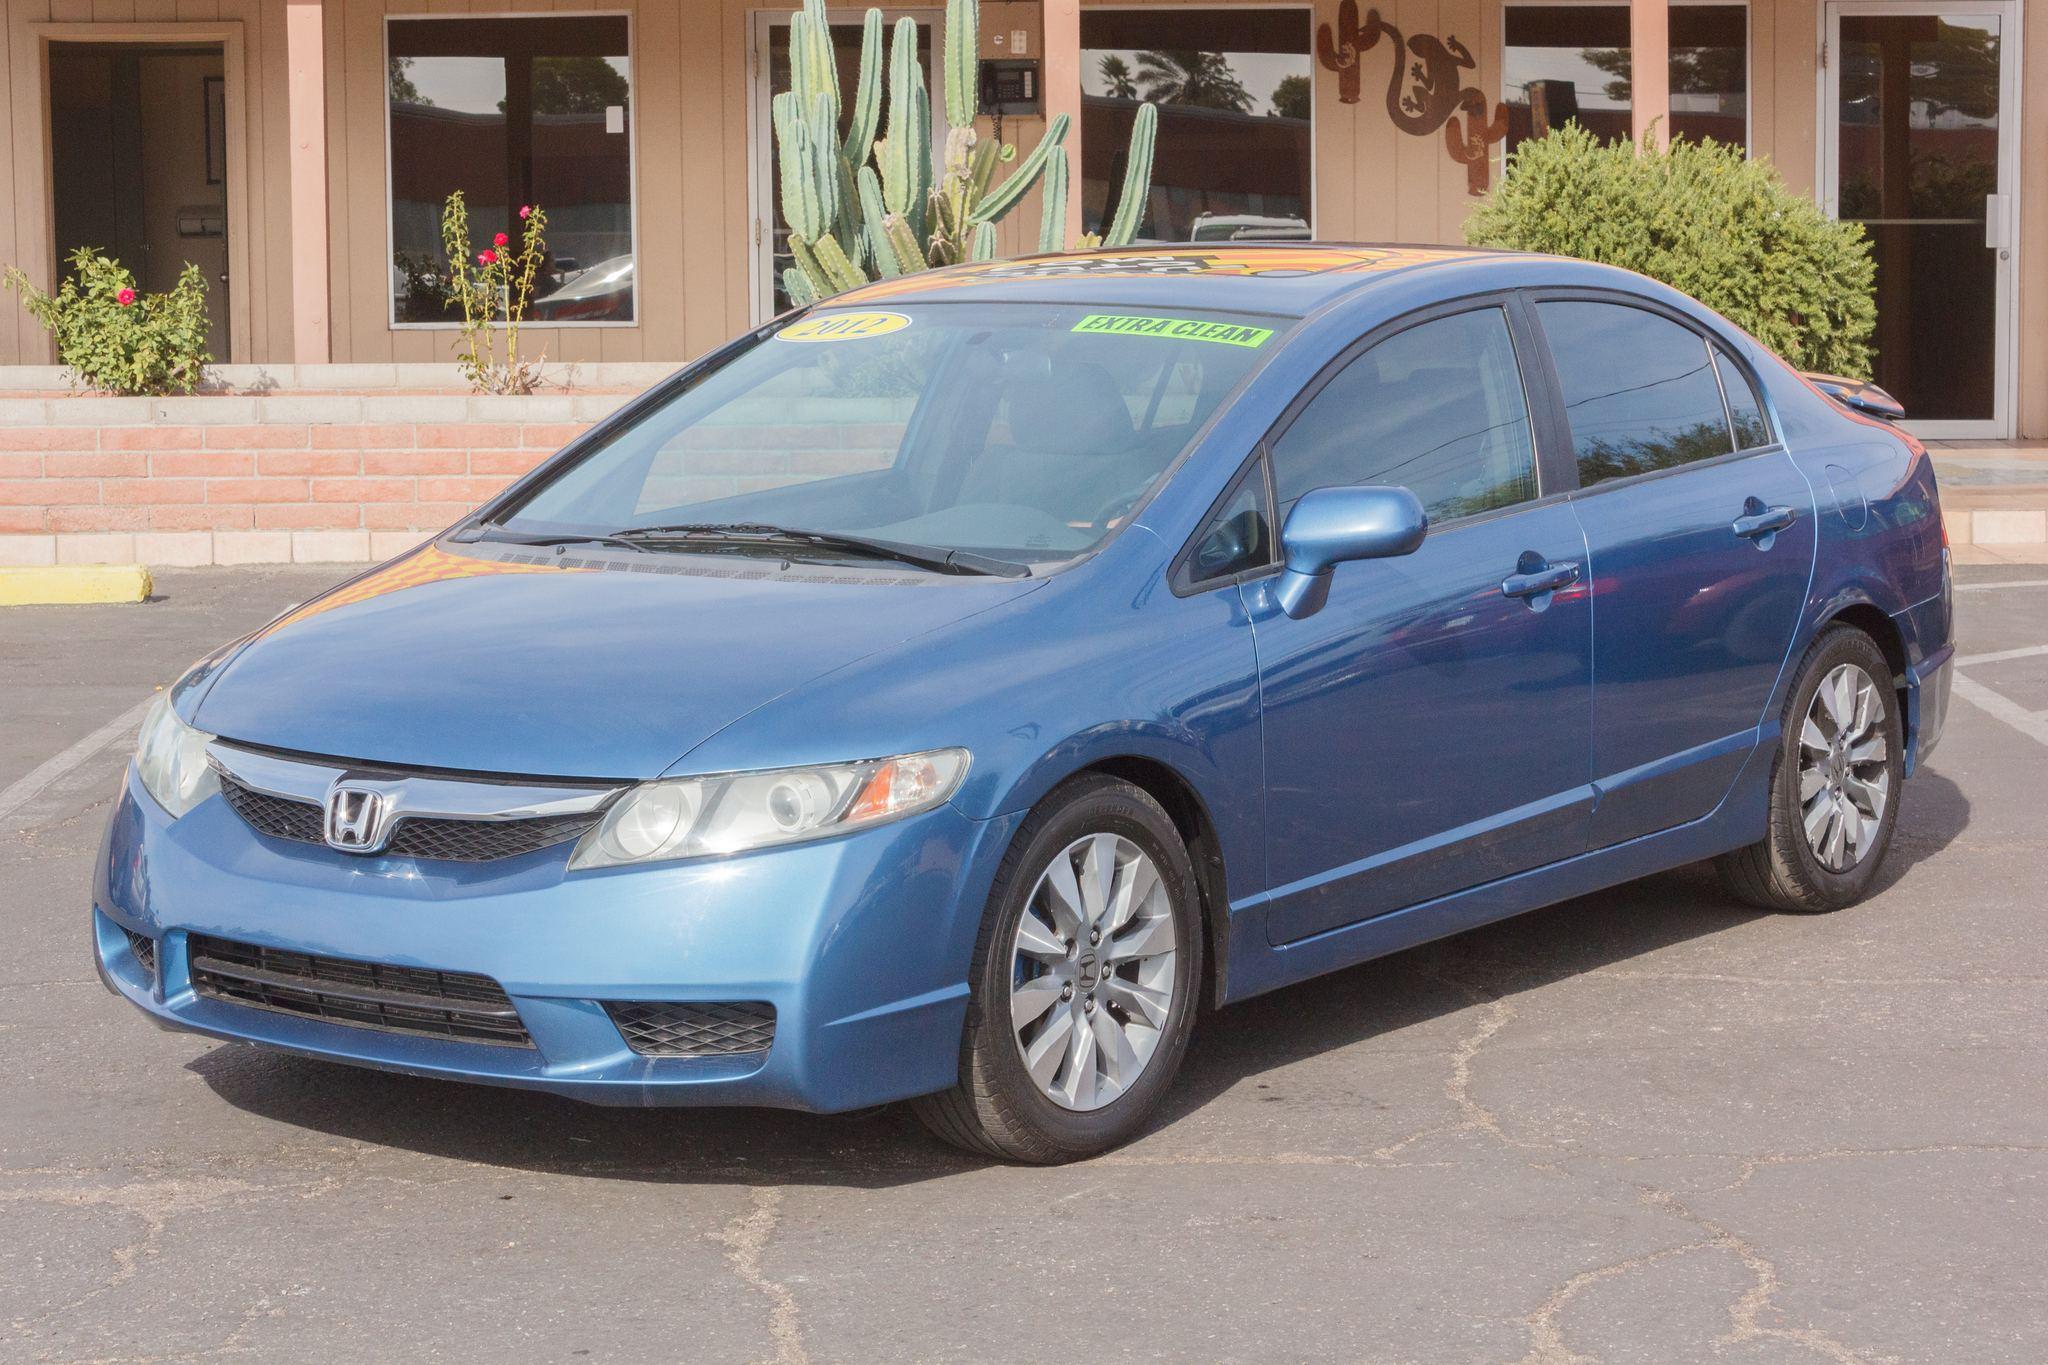 Photo of 2010 Honda Civic Sedan 4d Sedan EX Auto